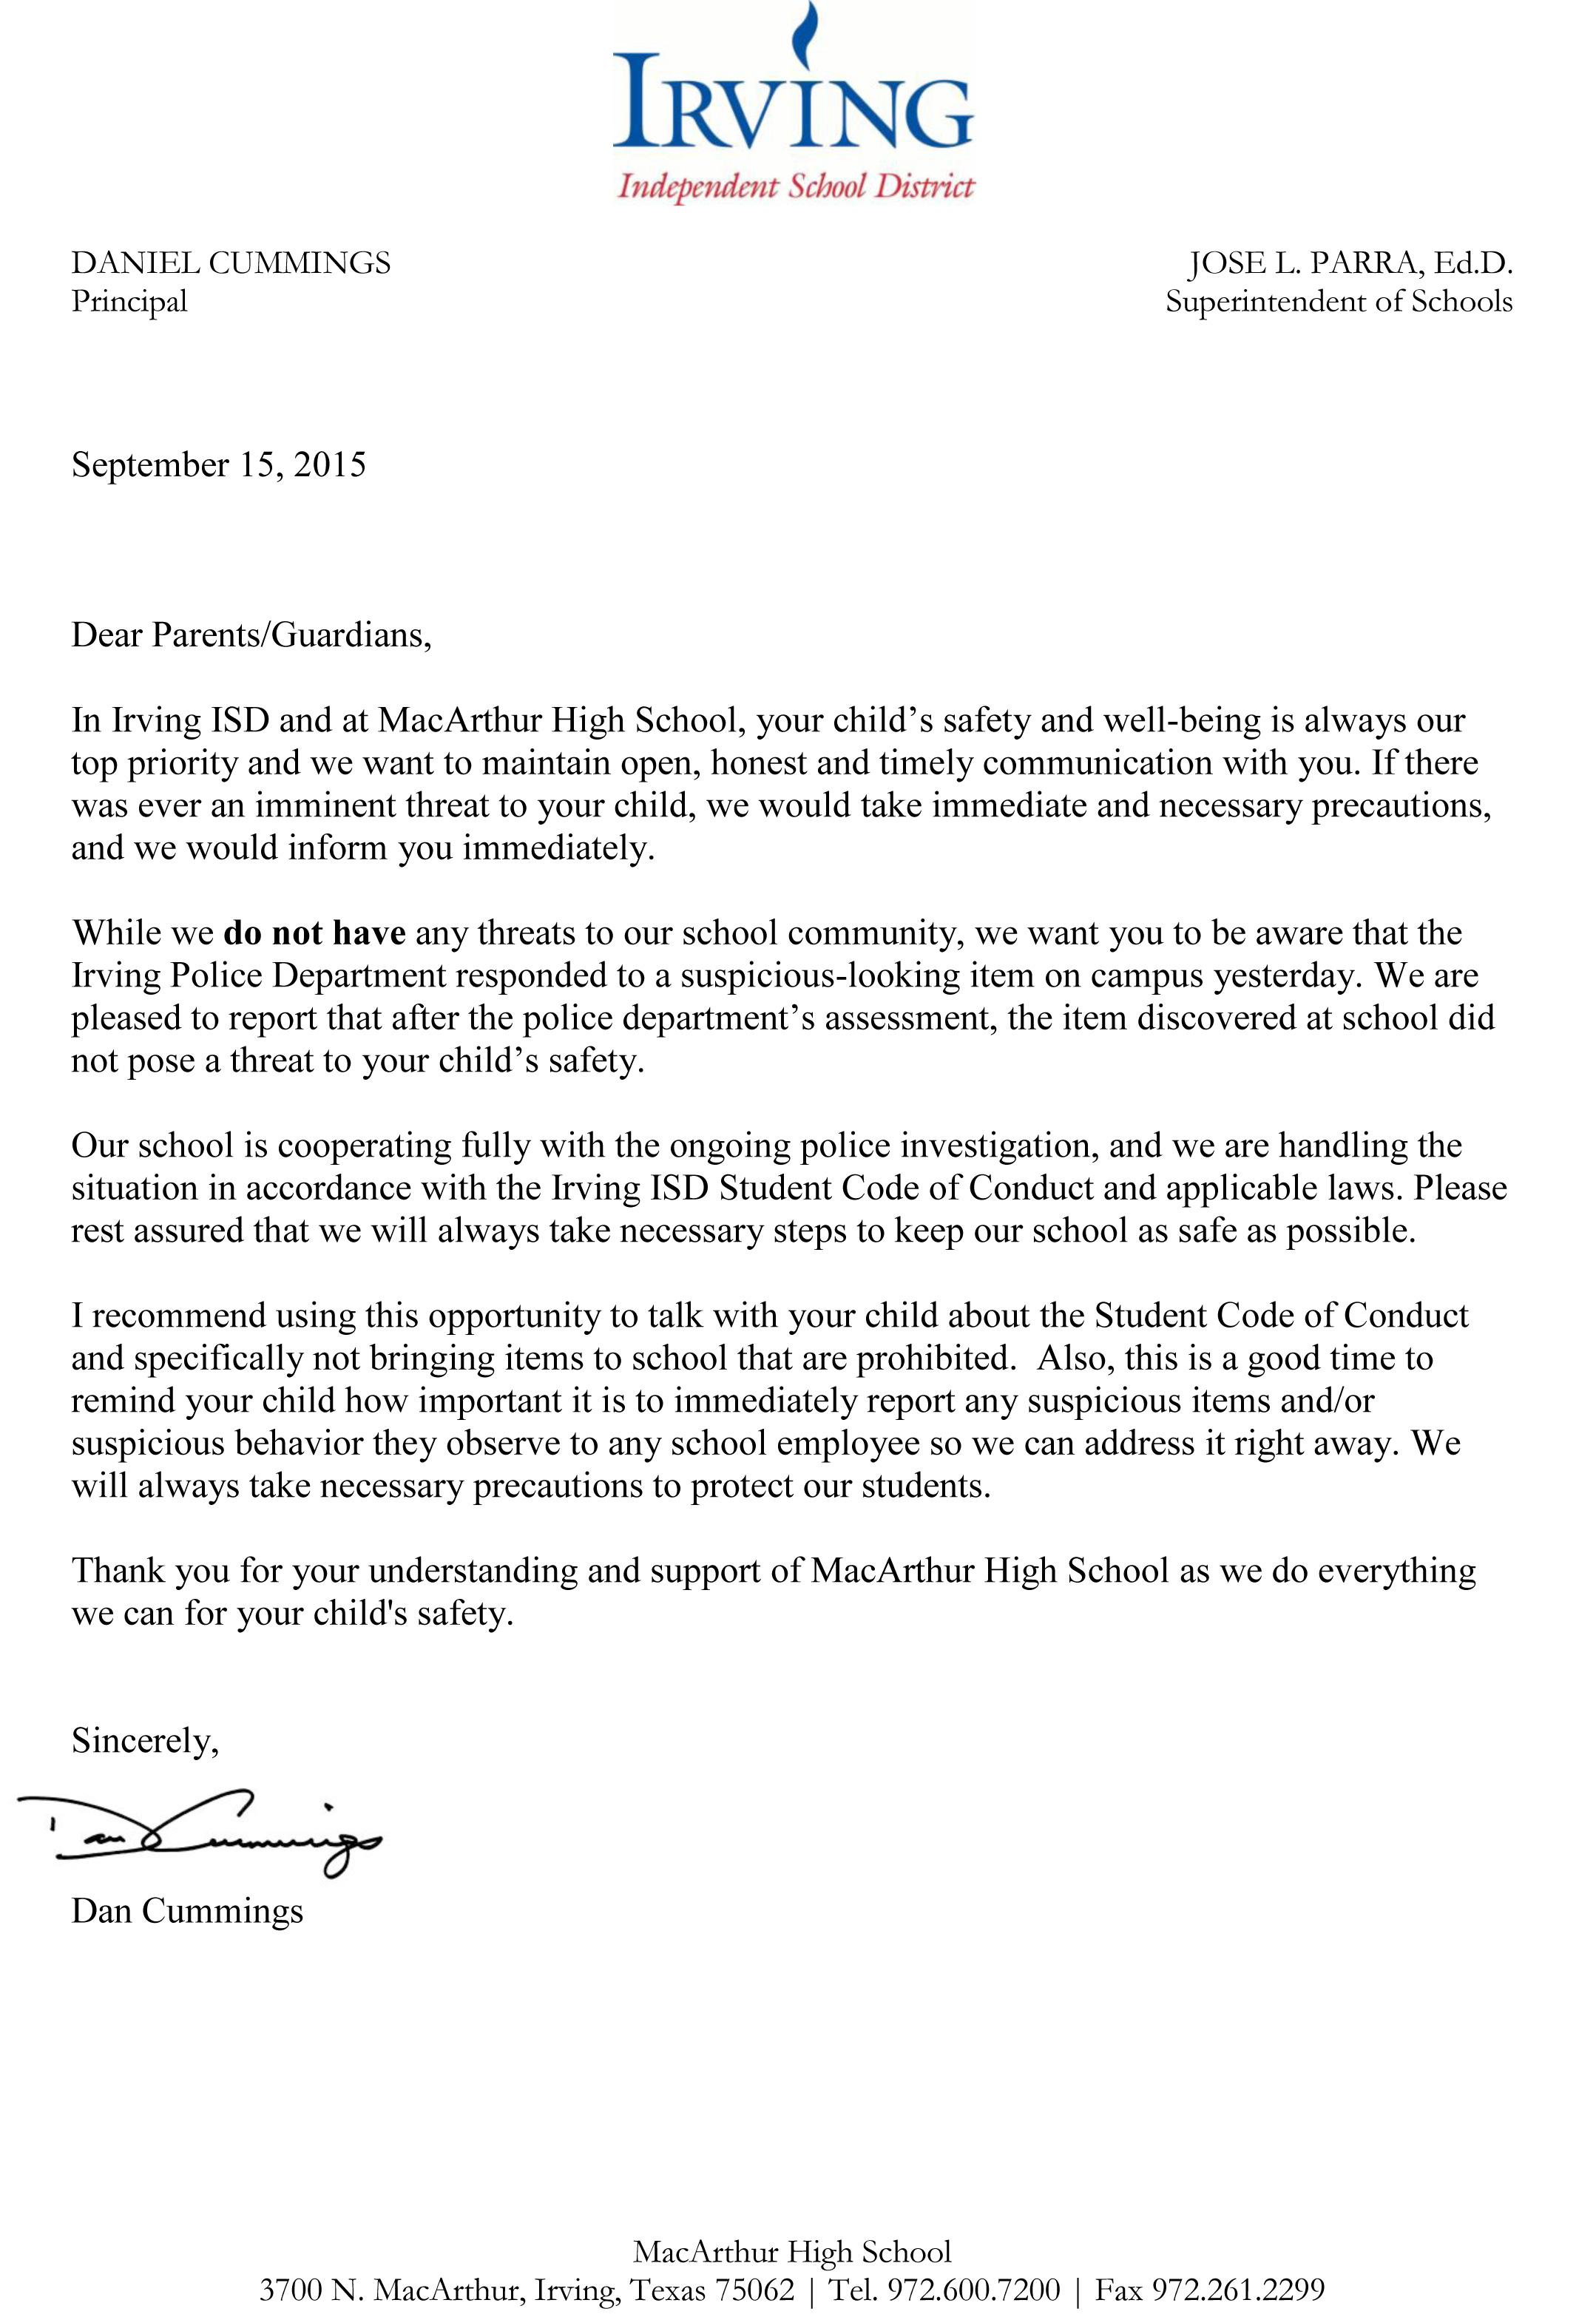 MacArthur High School Principal's Letter To Parents